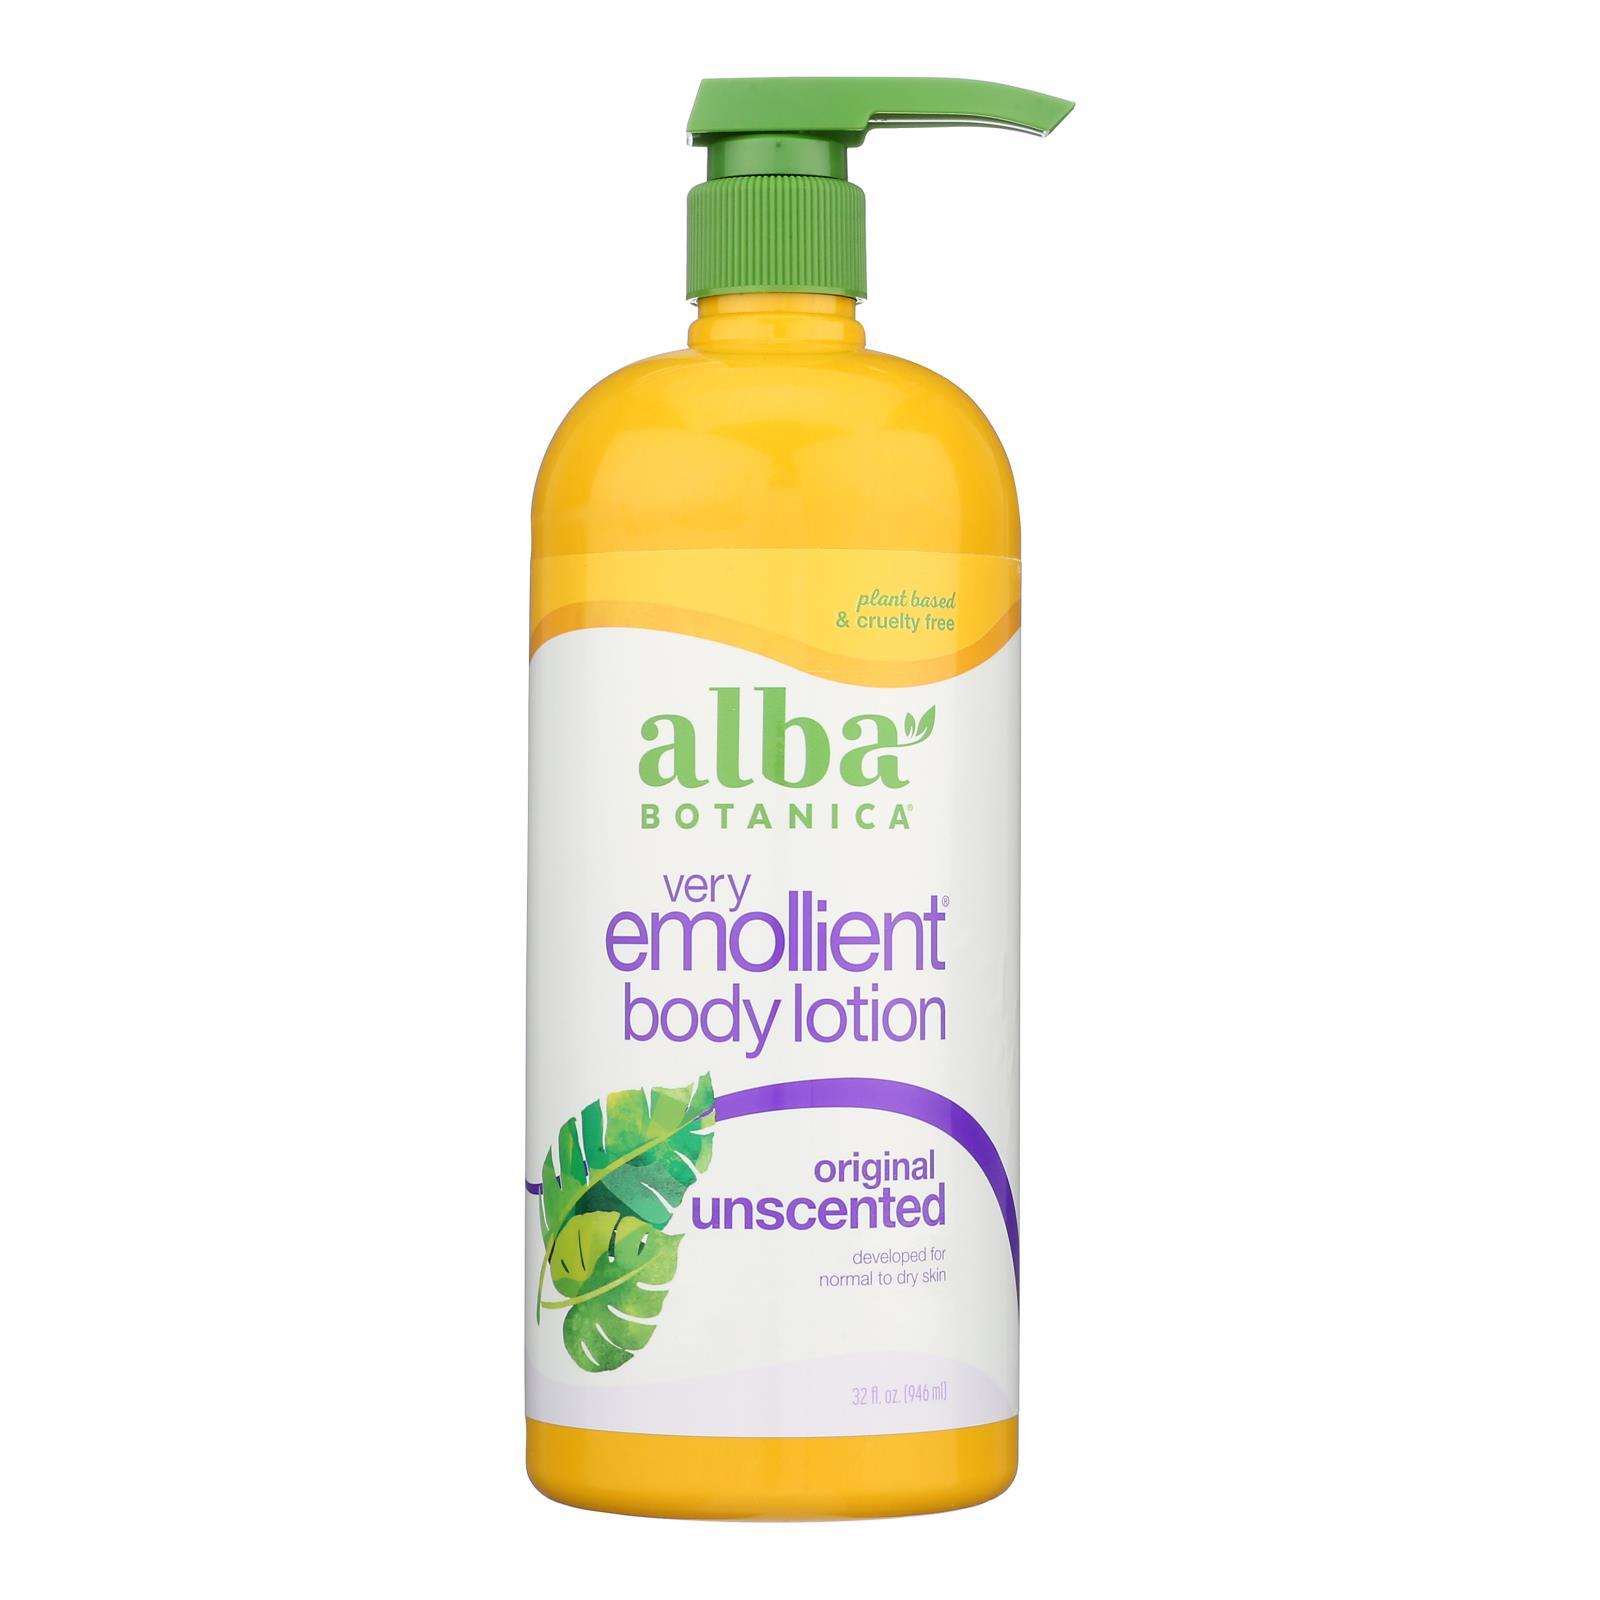 Alba Botanica - Very Emollient Body Lotion - Unscented - 32 fl oz